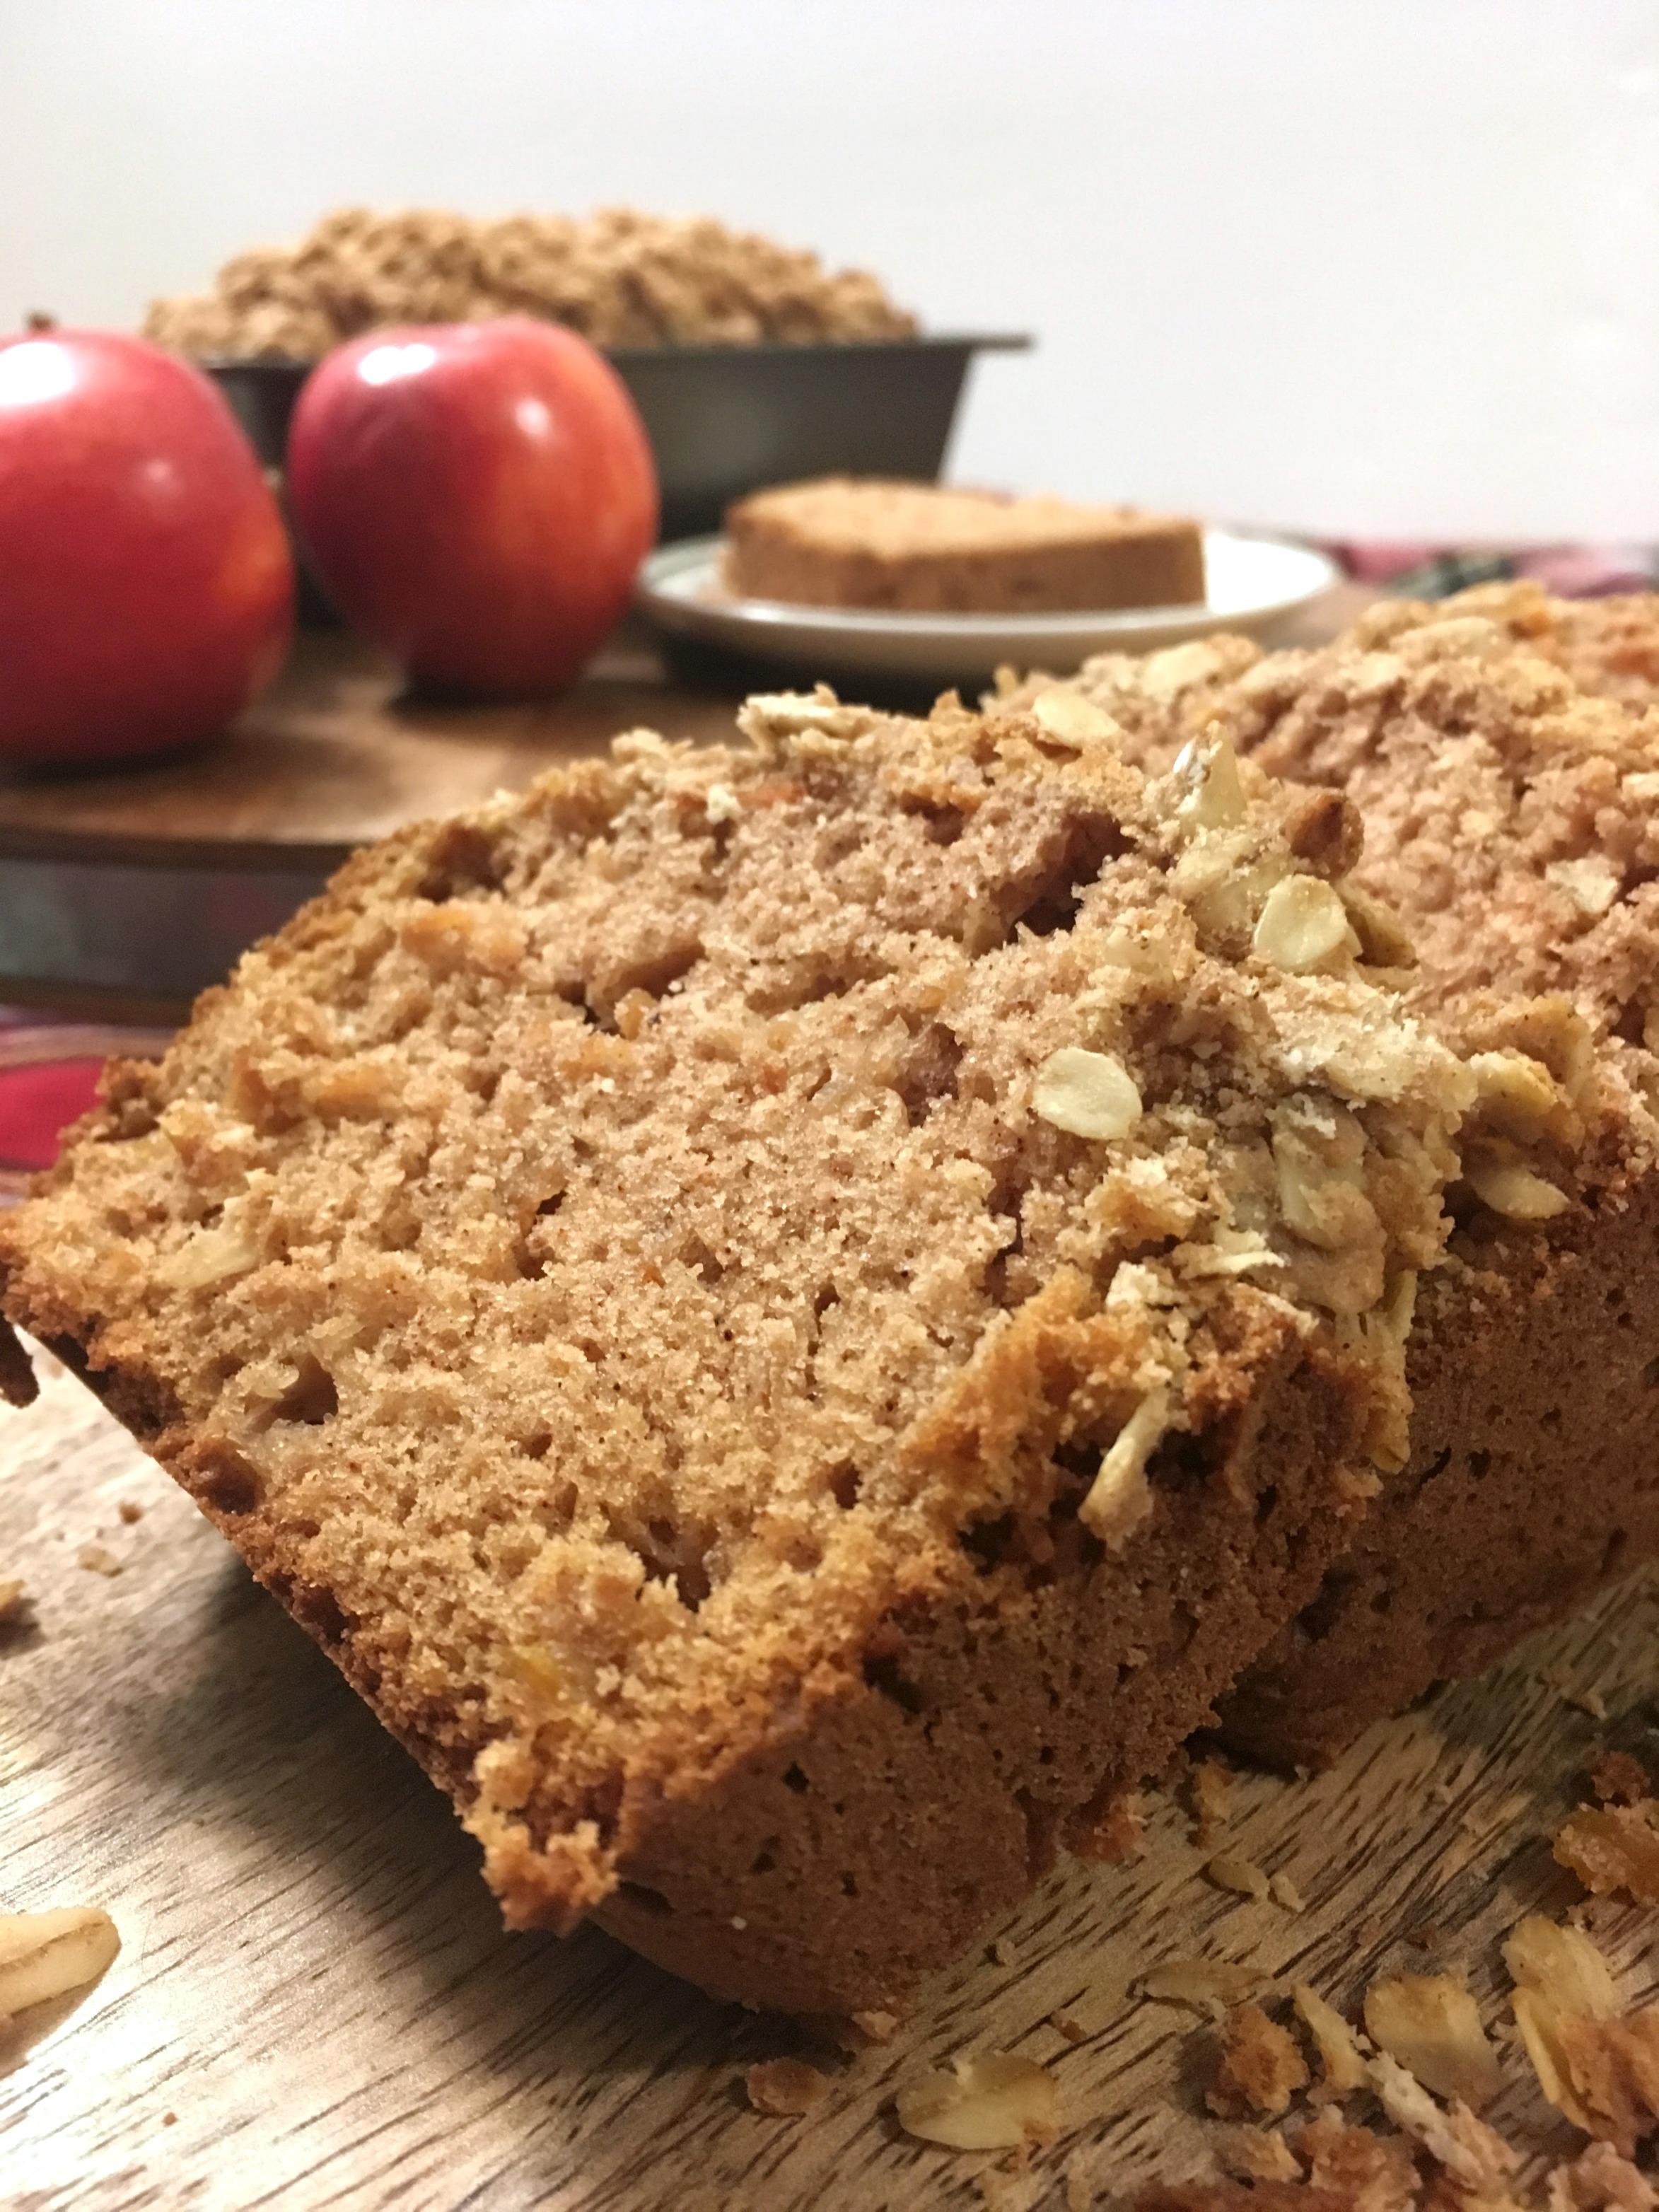 Greek Yogurt Apple Cinnamon Bread with Oatmeal Crumble Topping